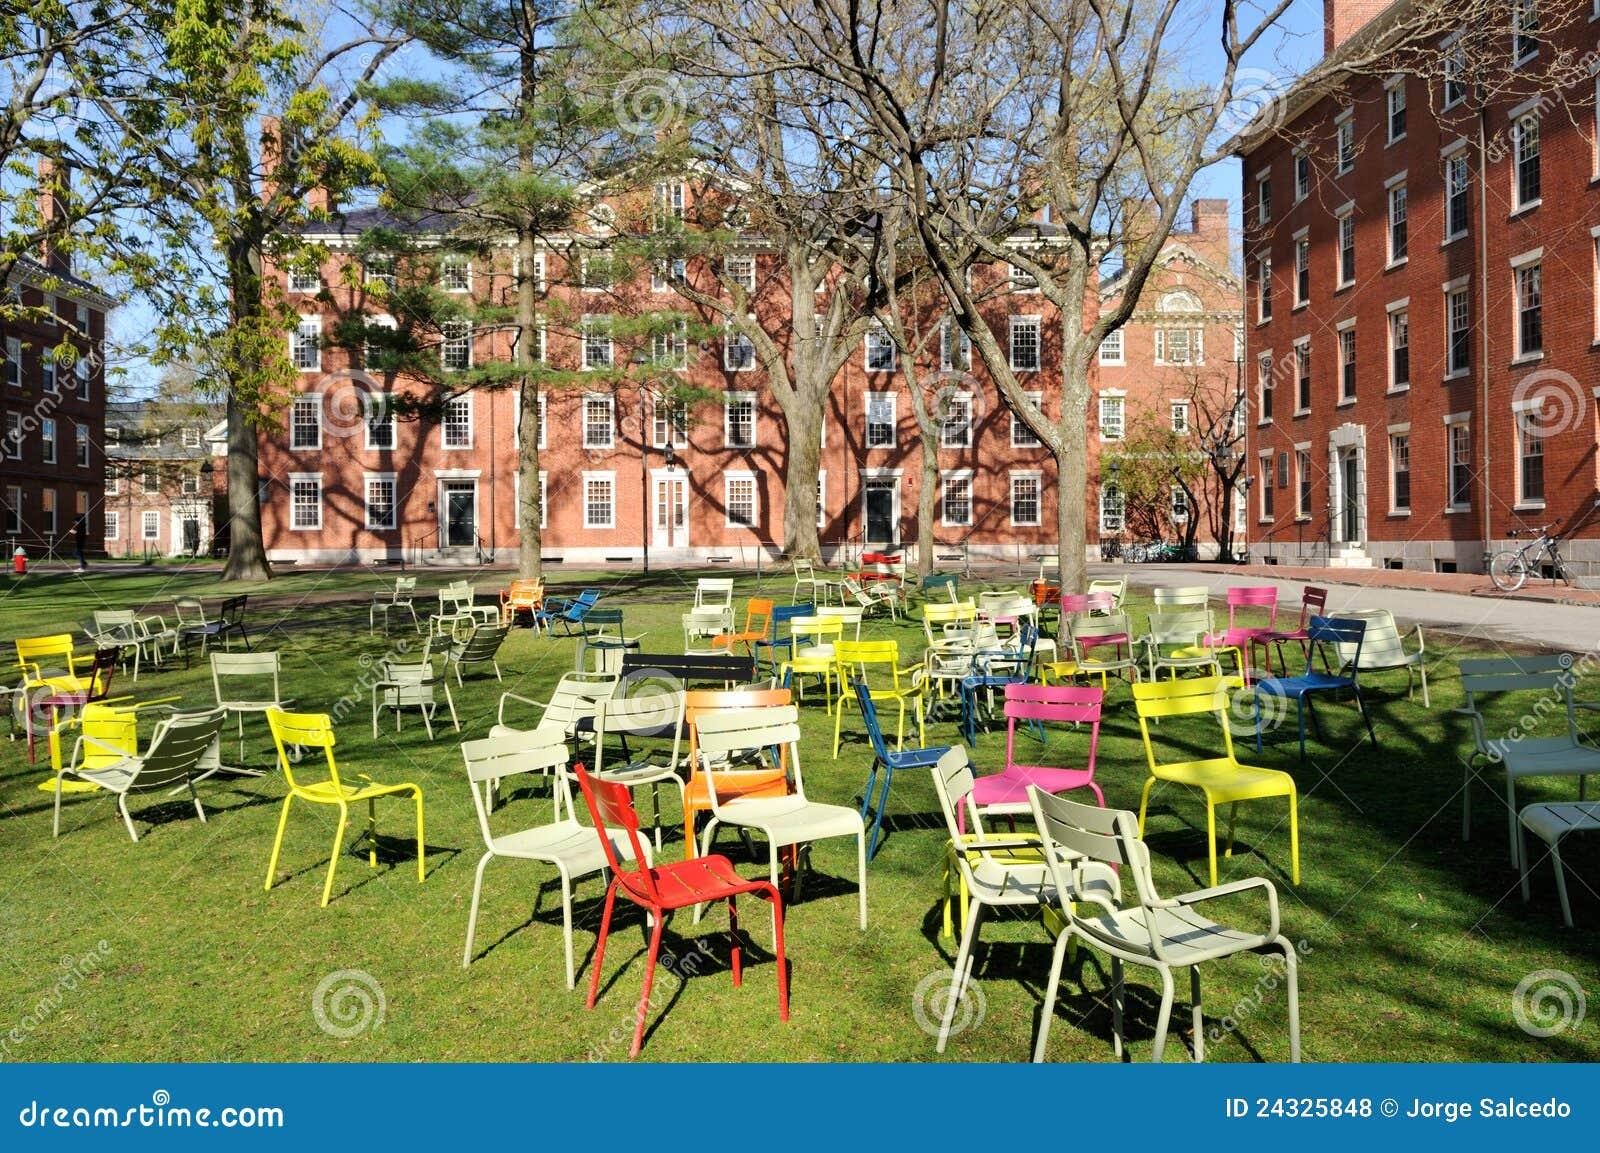 Harvard Yard Royalty Free Stock Photos Image 24325848